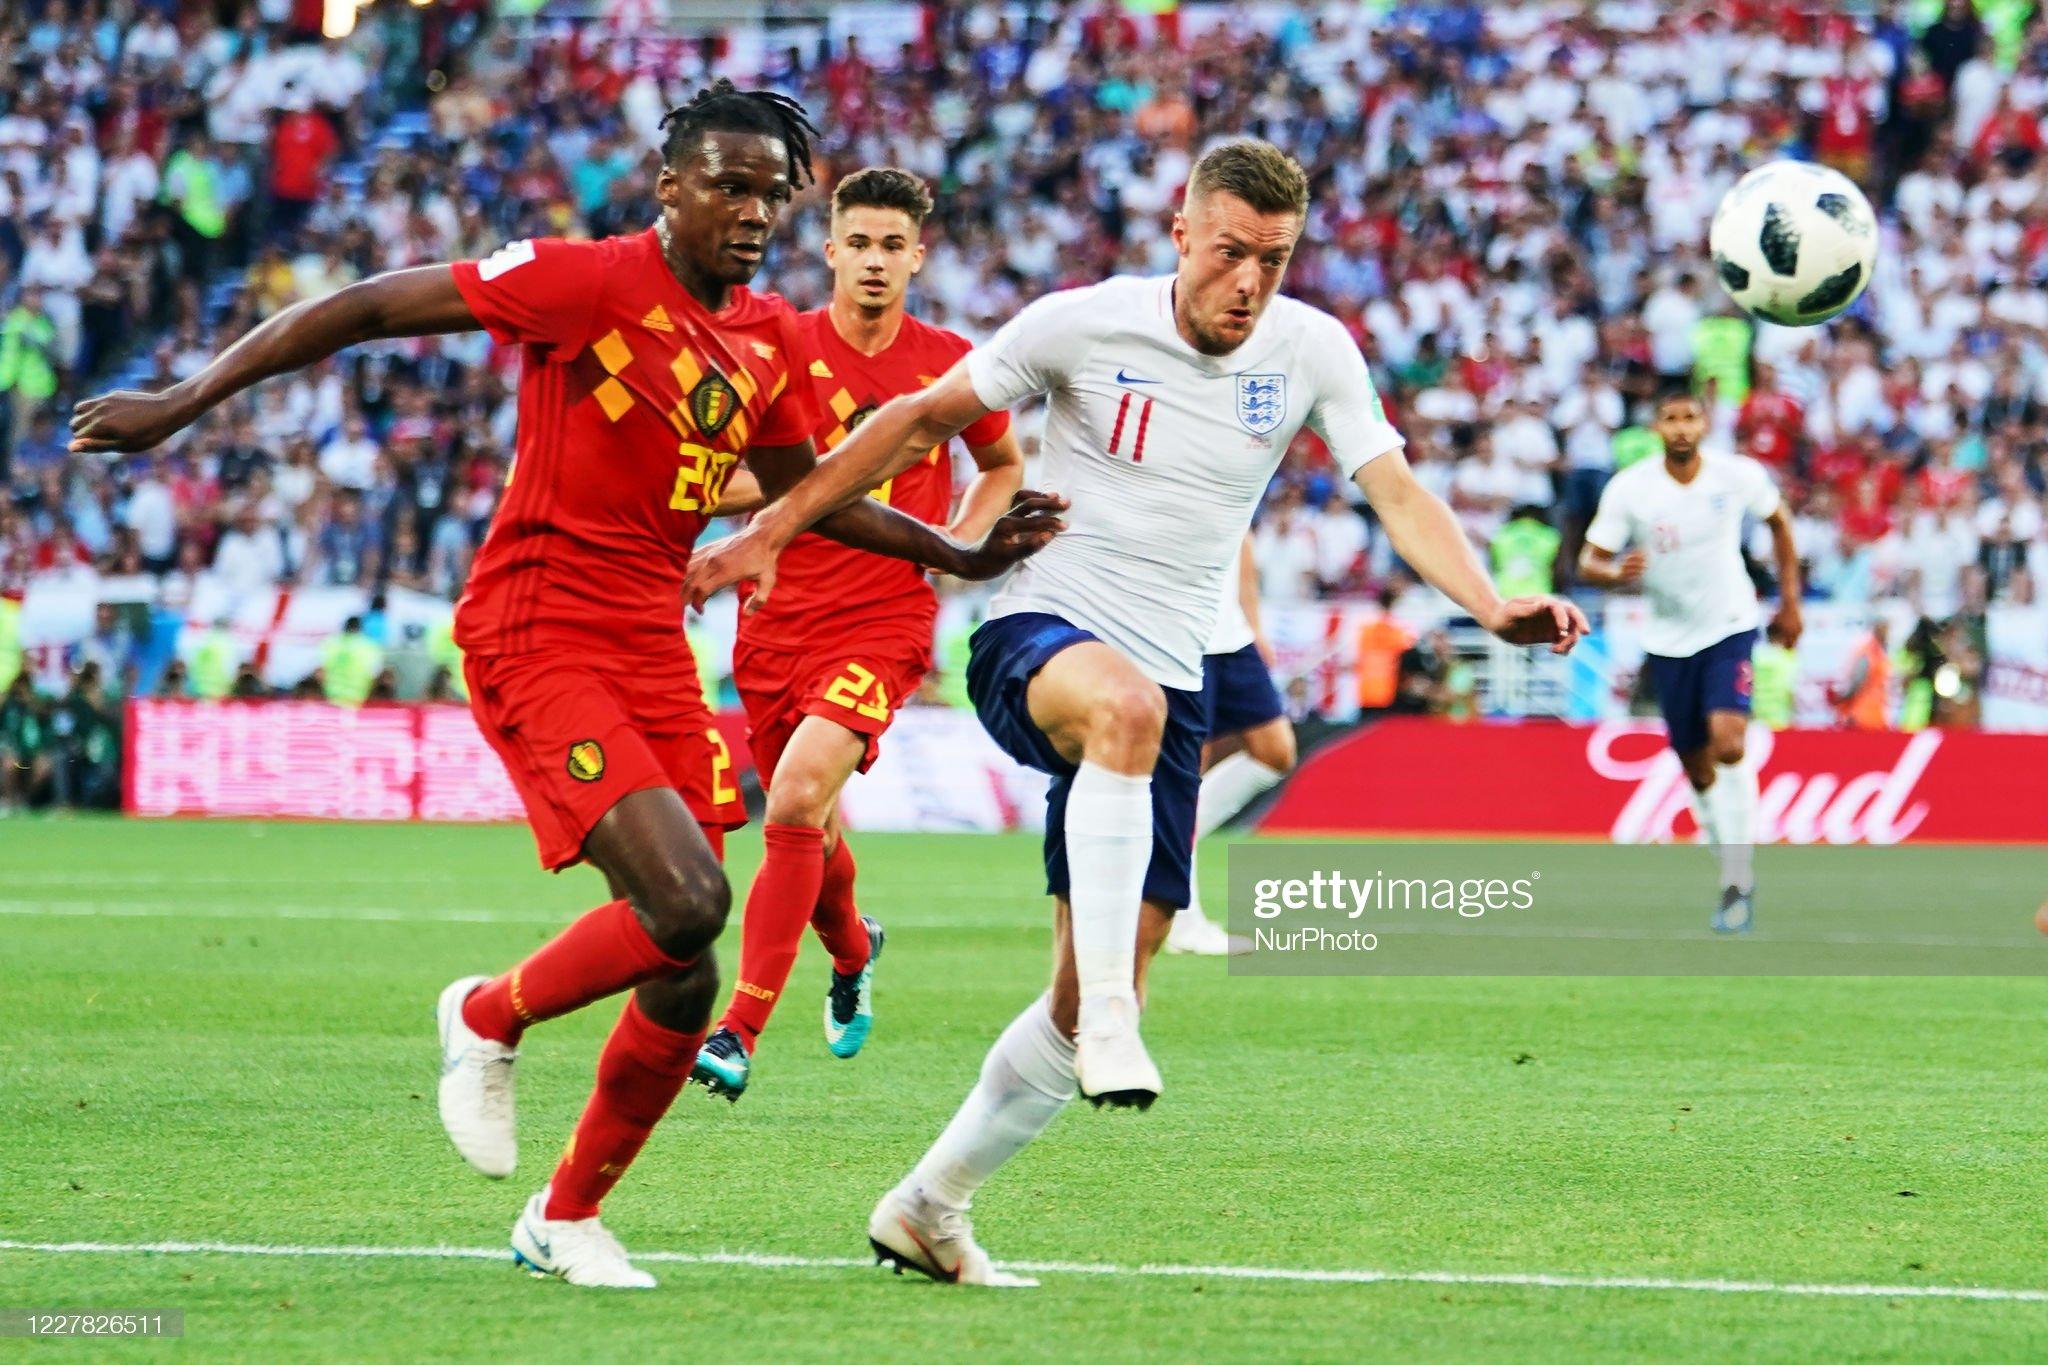 Belgium vs England preview, prediction and odds